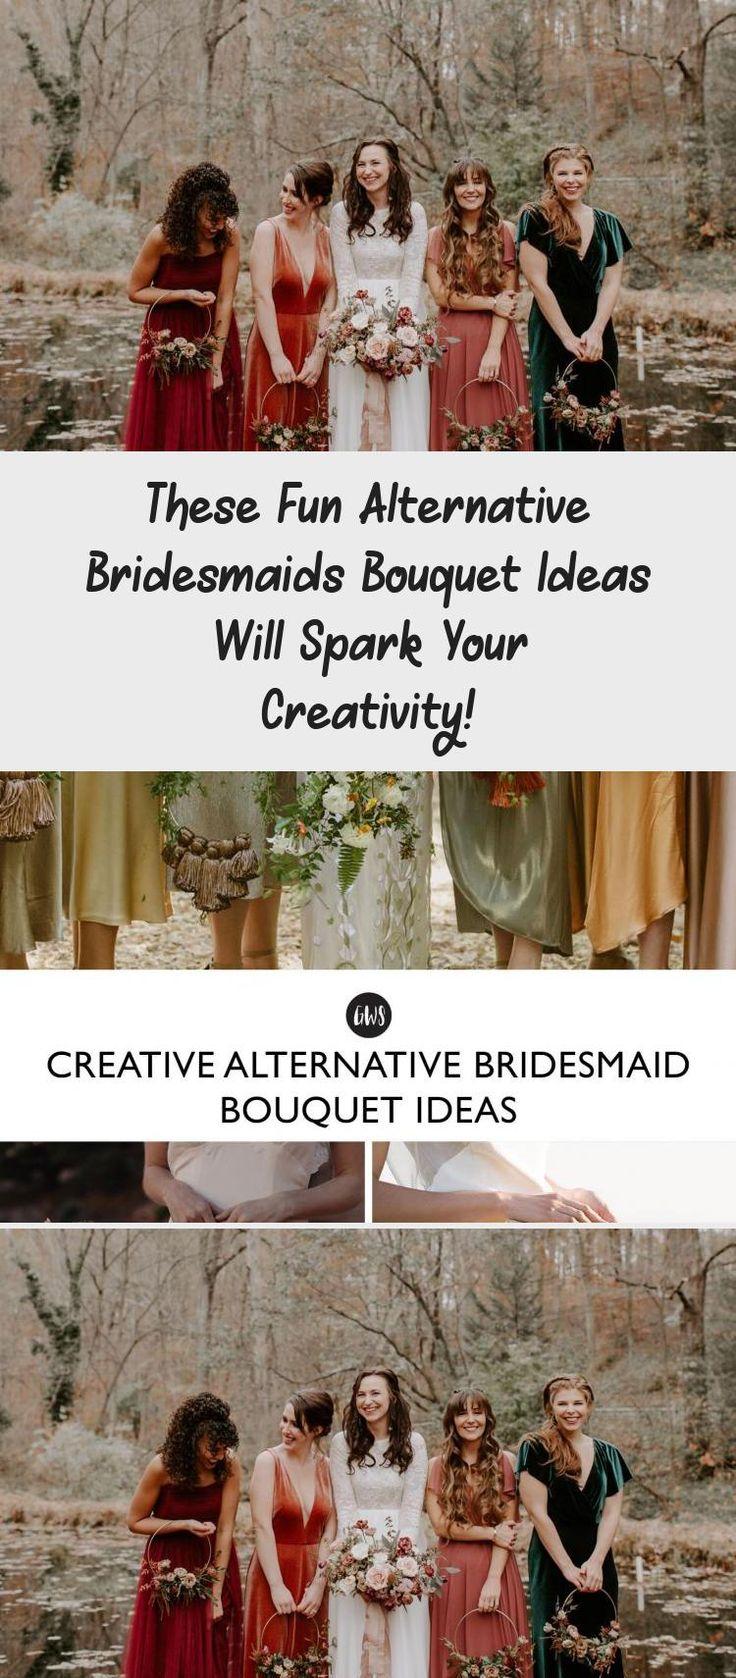 These Fun Alternative Bridesmaids Bouquet Ideas Will Spark Your Creativity! - Green Wedding Shoes #BridesmaidDressesColors #SatinBridesmaidDresses #BridesmaidDressesMint #OrangeBridesmaidDresses #BridesmaidDressesMuslim